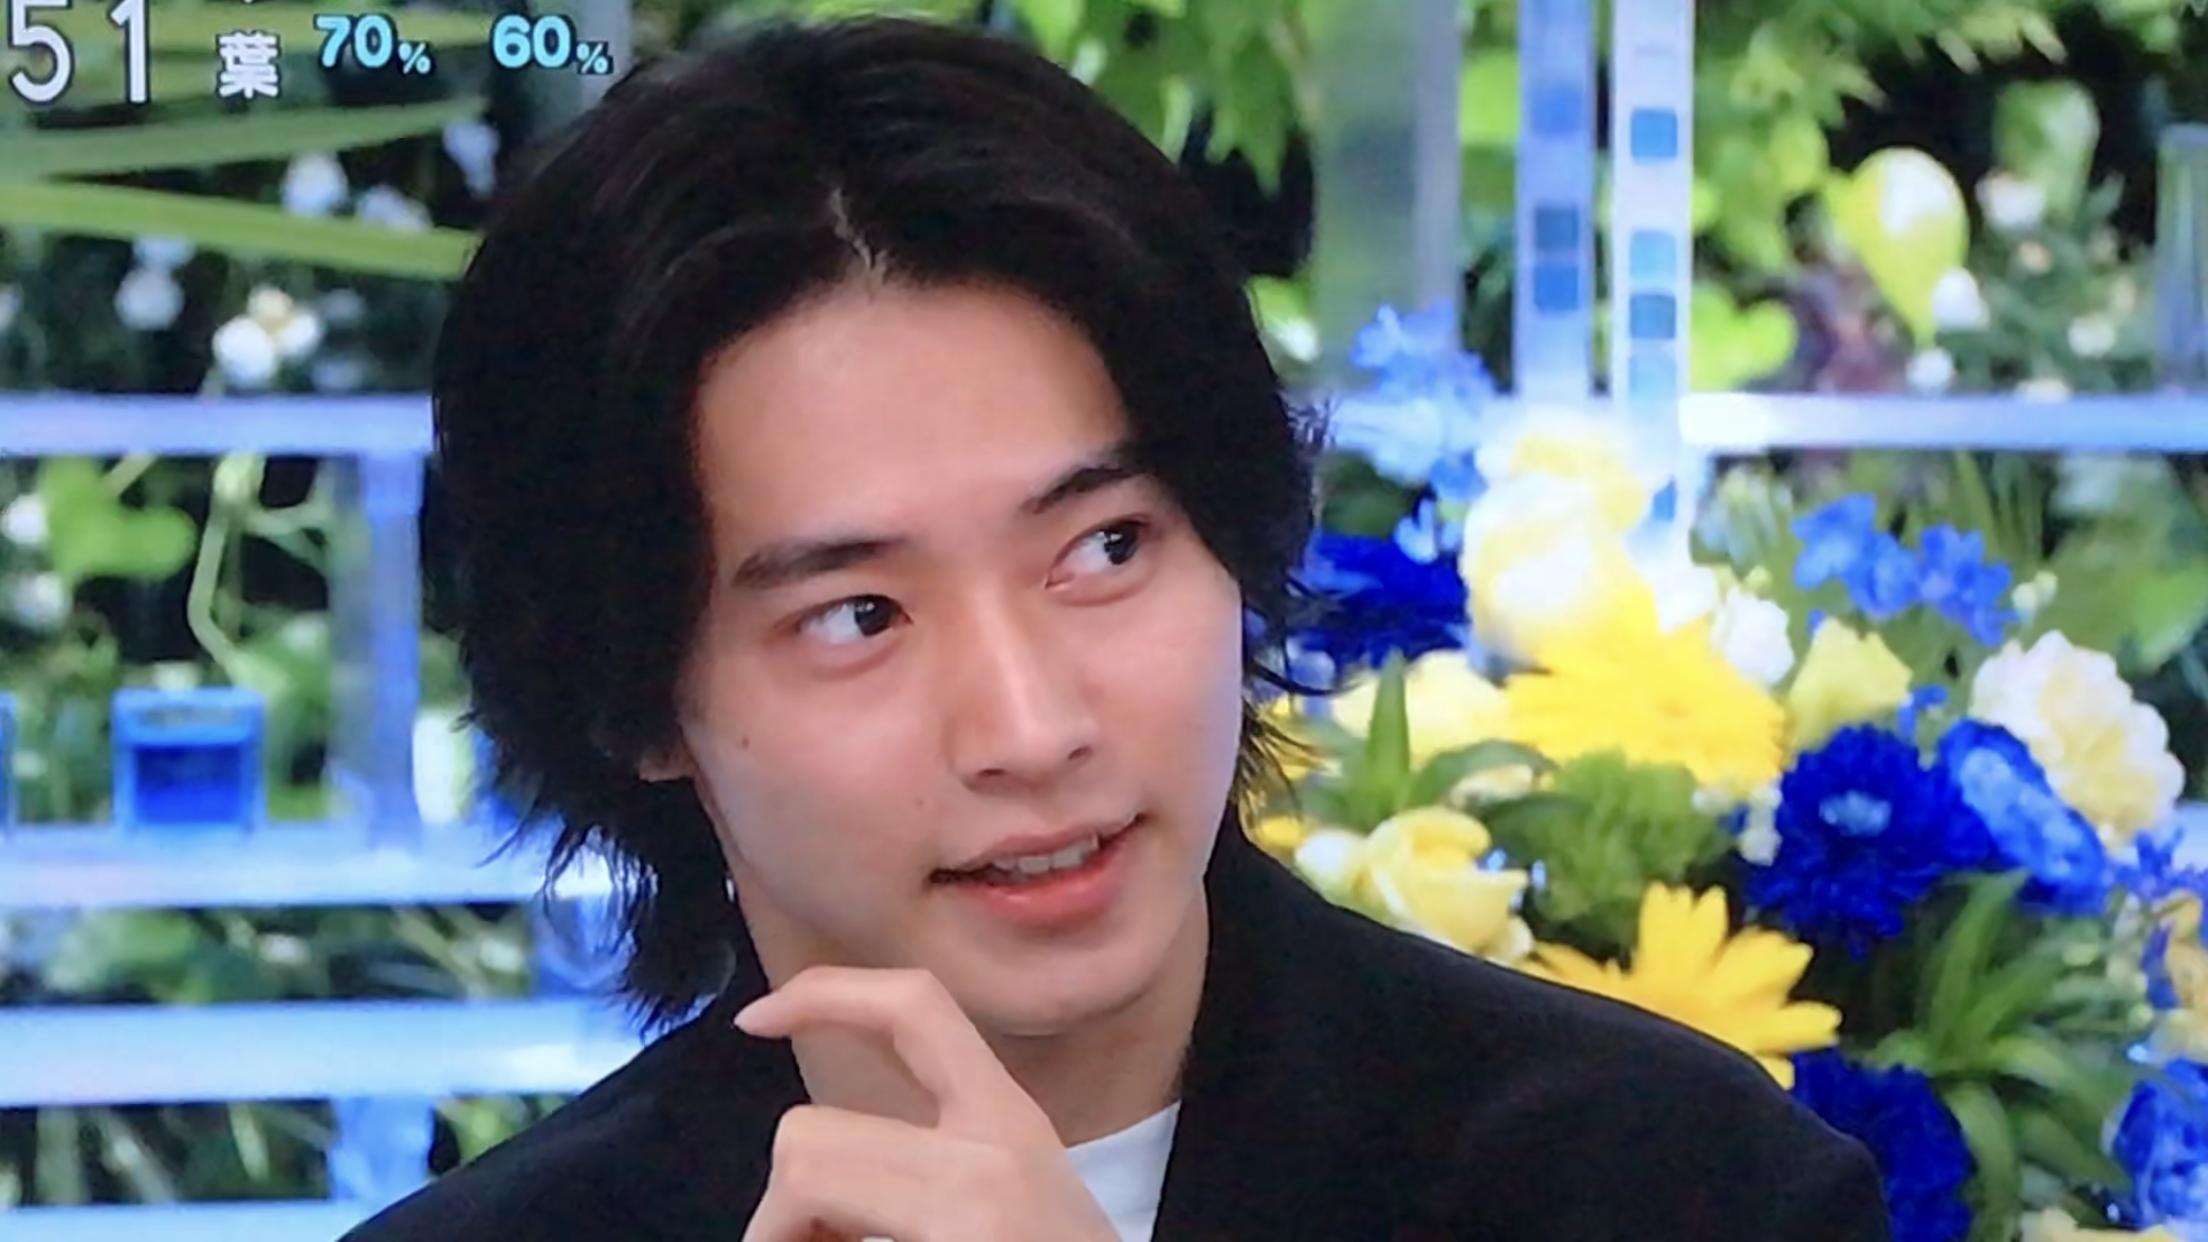 「Yamazaki Kento 山崎 賢人」おしゃれまとめの人気アイデア|Pinterest|Hxnibee